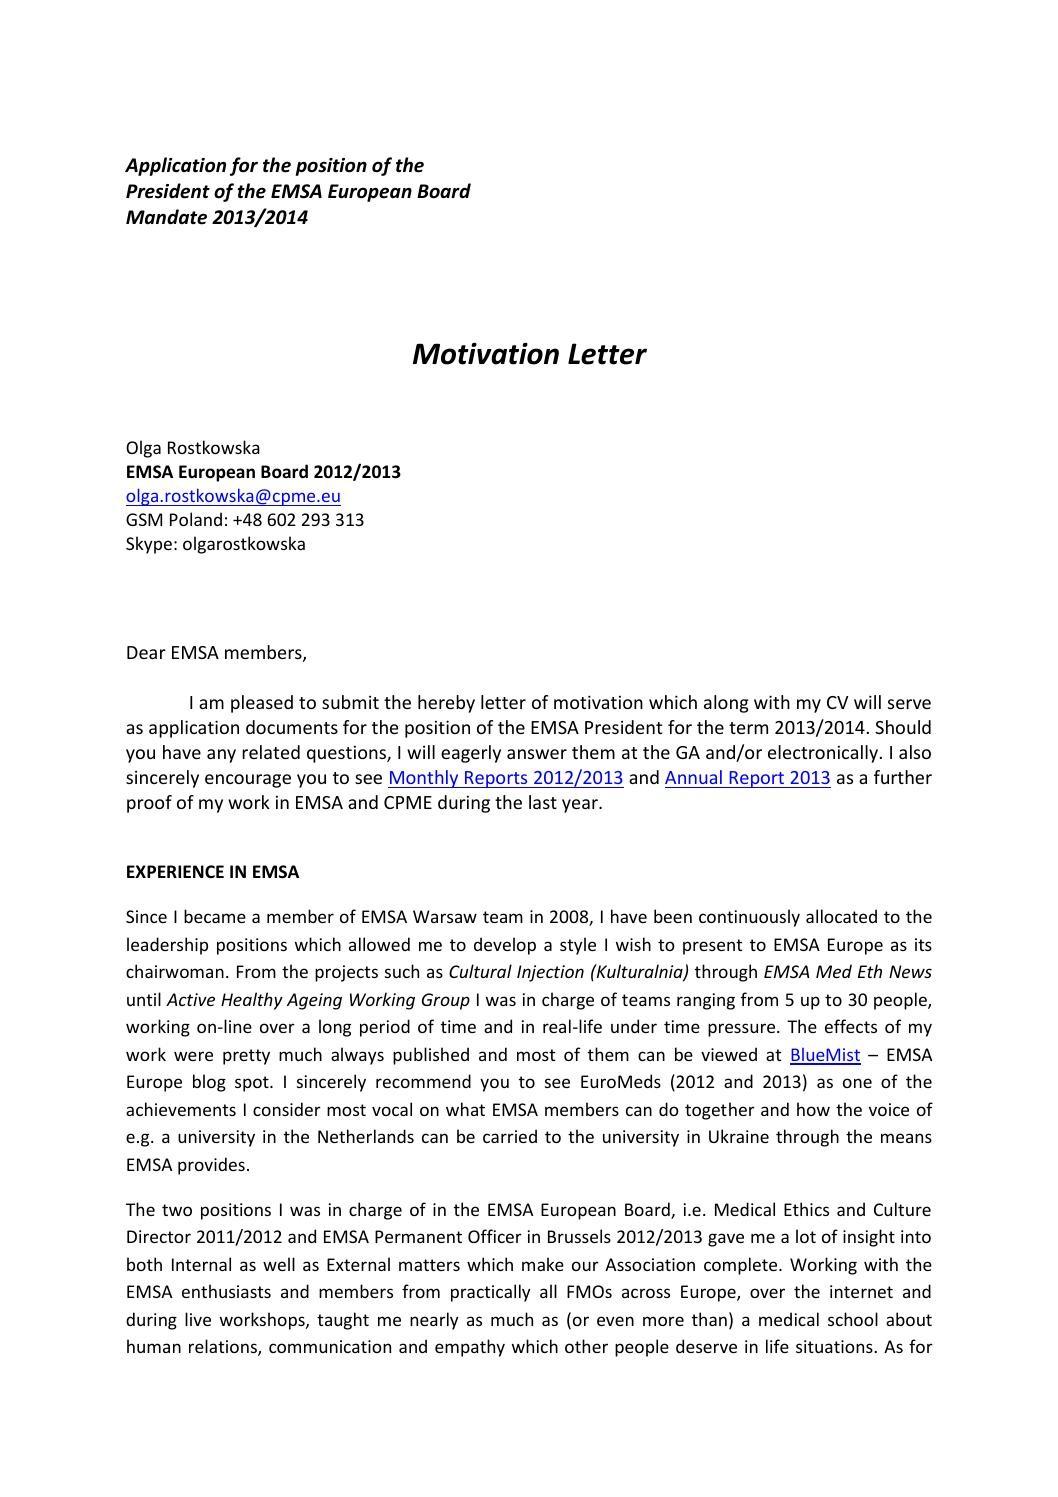 motivation letter for research internship  Motivation letter for internship. How to Write Essay or ..